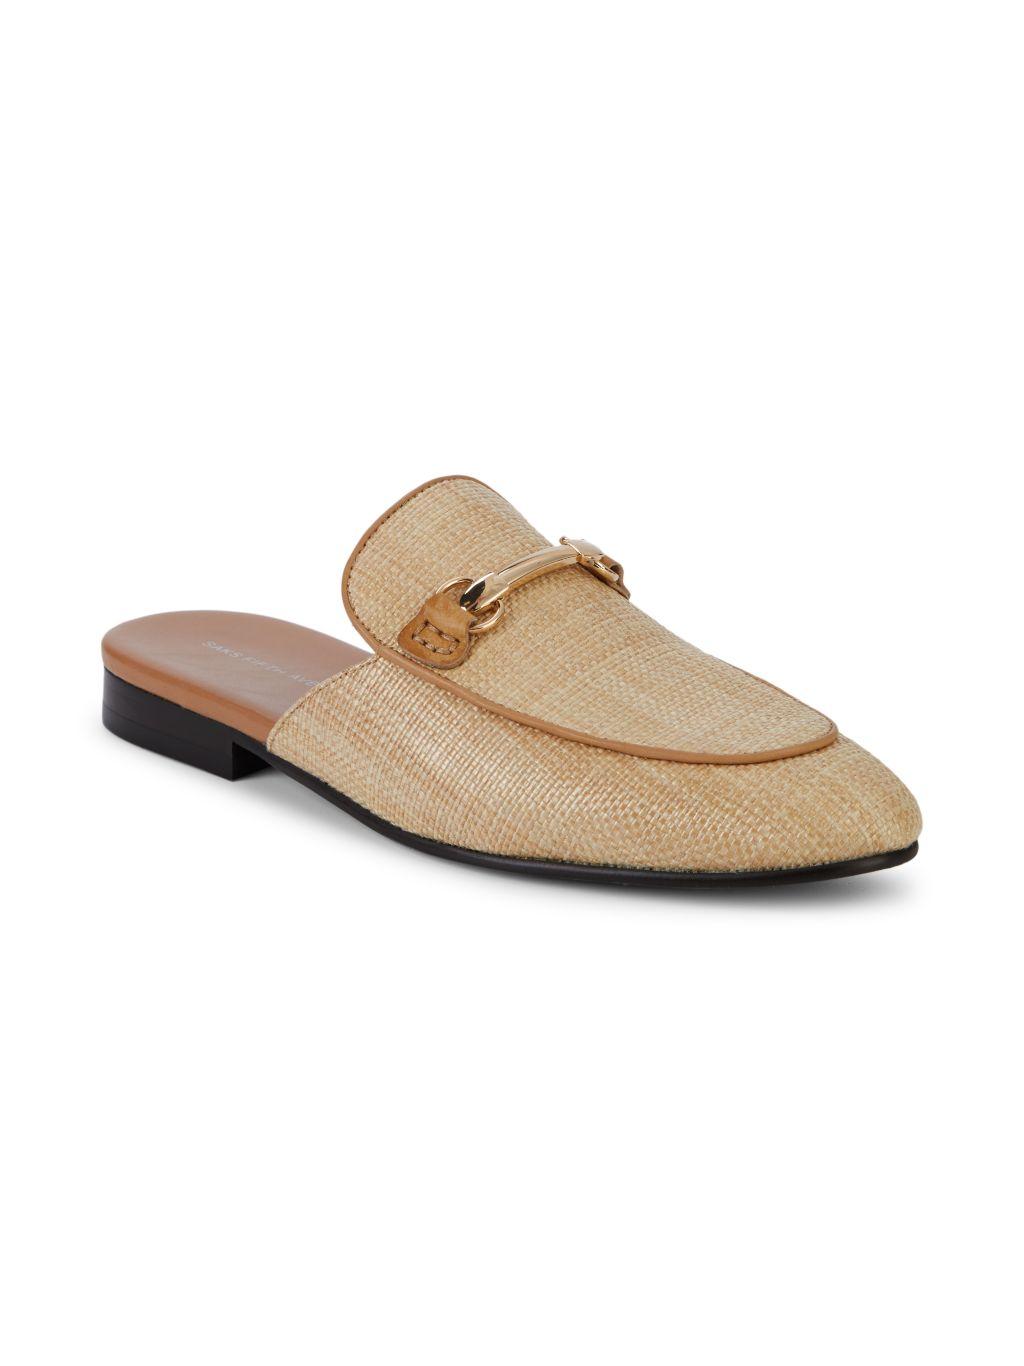 Saks Fifth Avenue Reese Raffia Leather-Trim Horsebit Mule Loafers